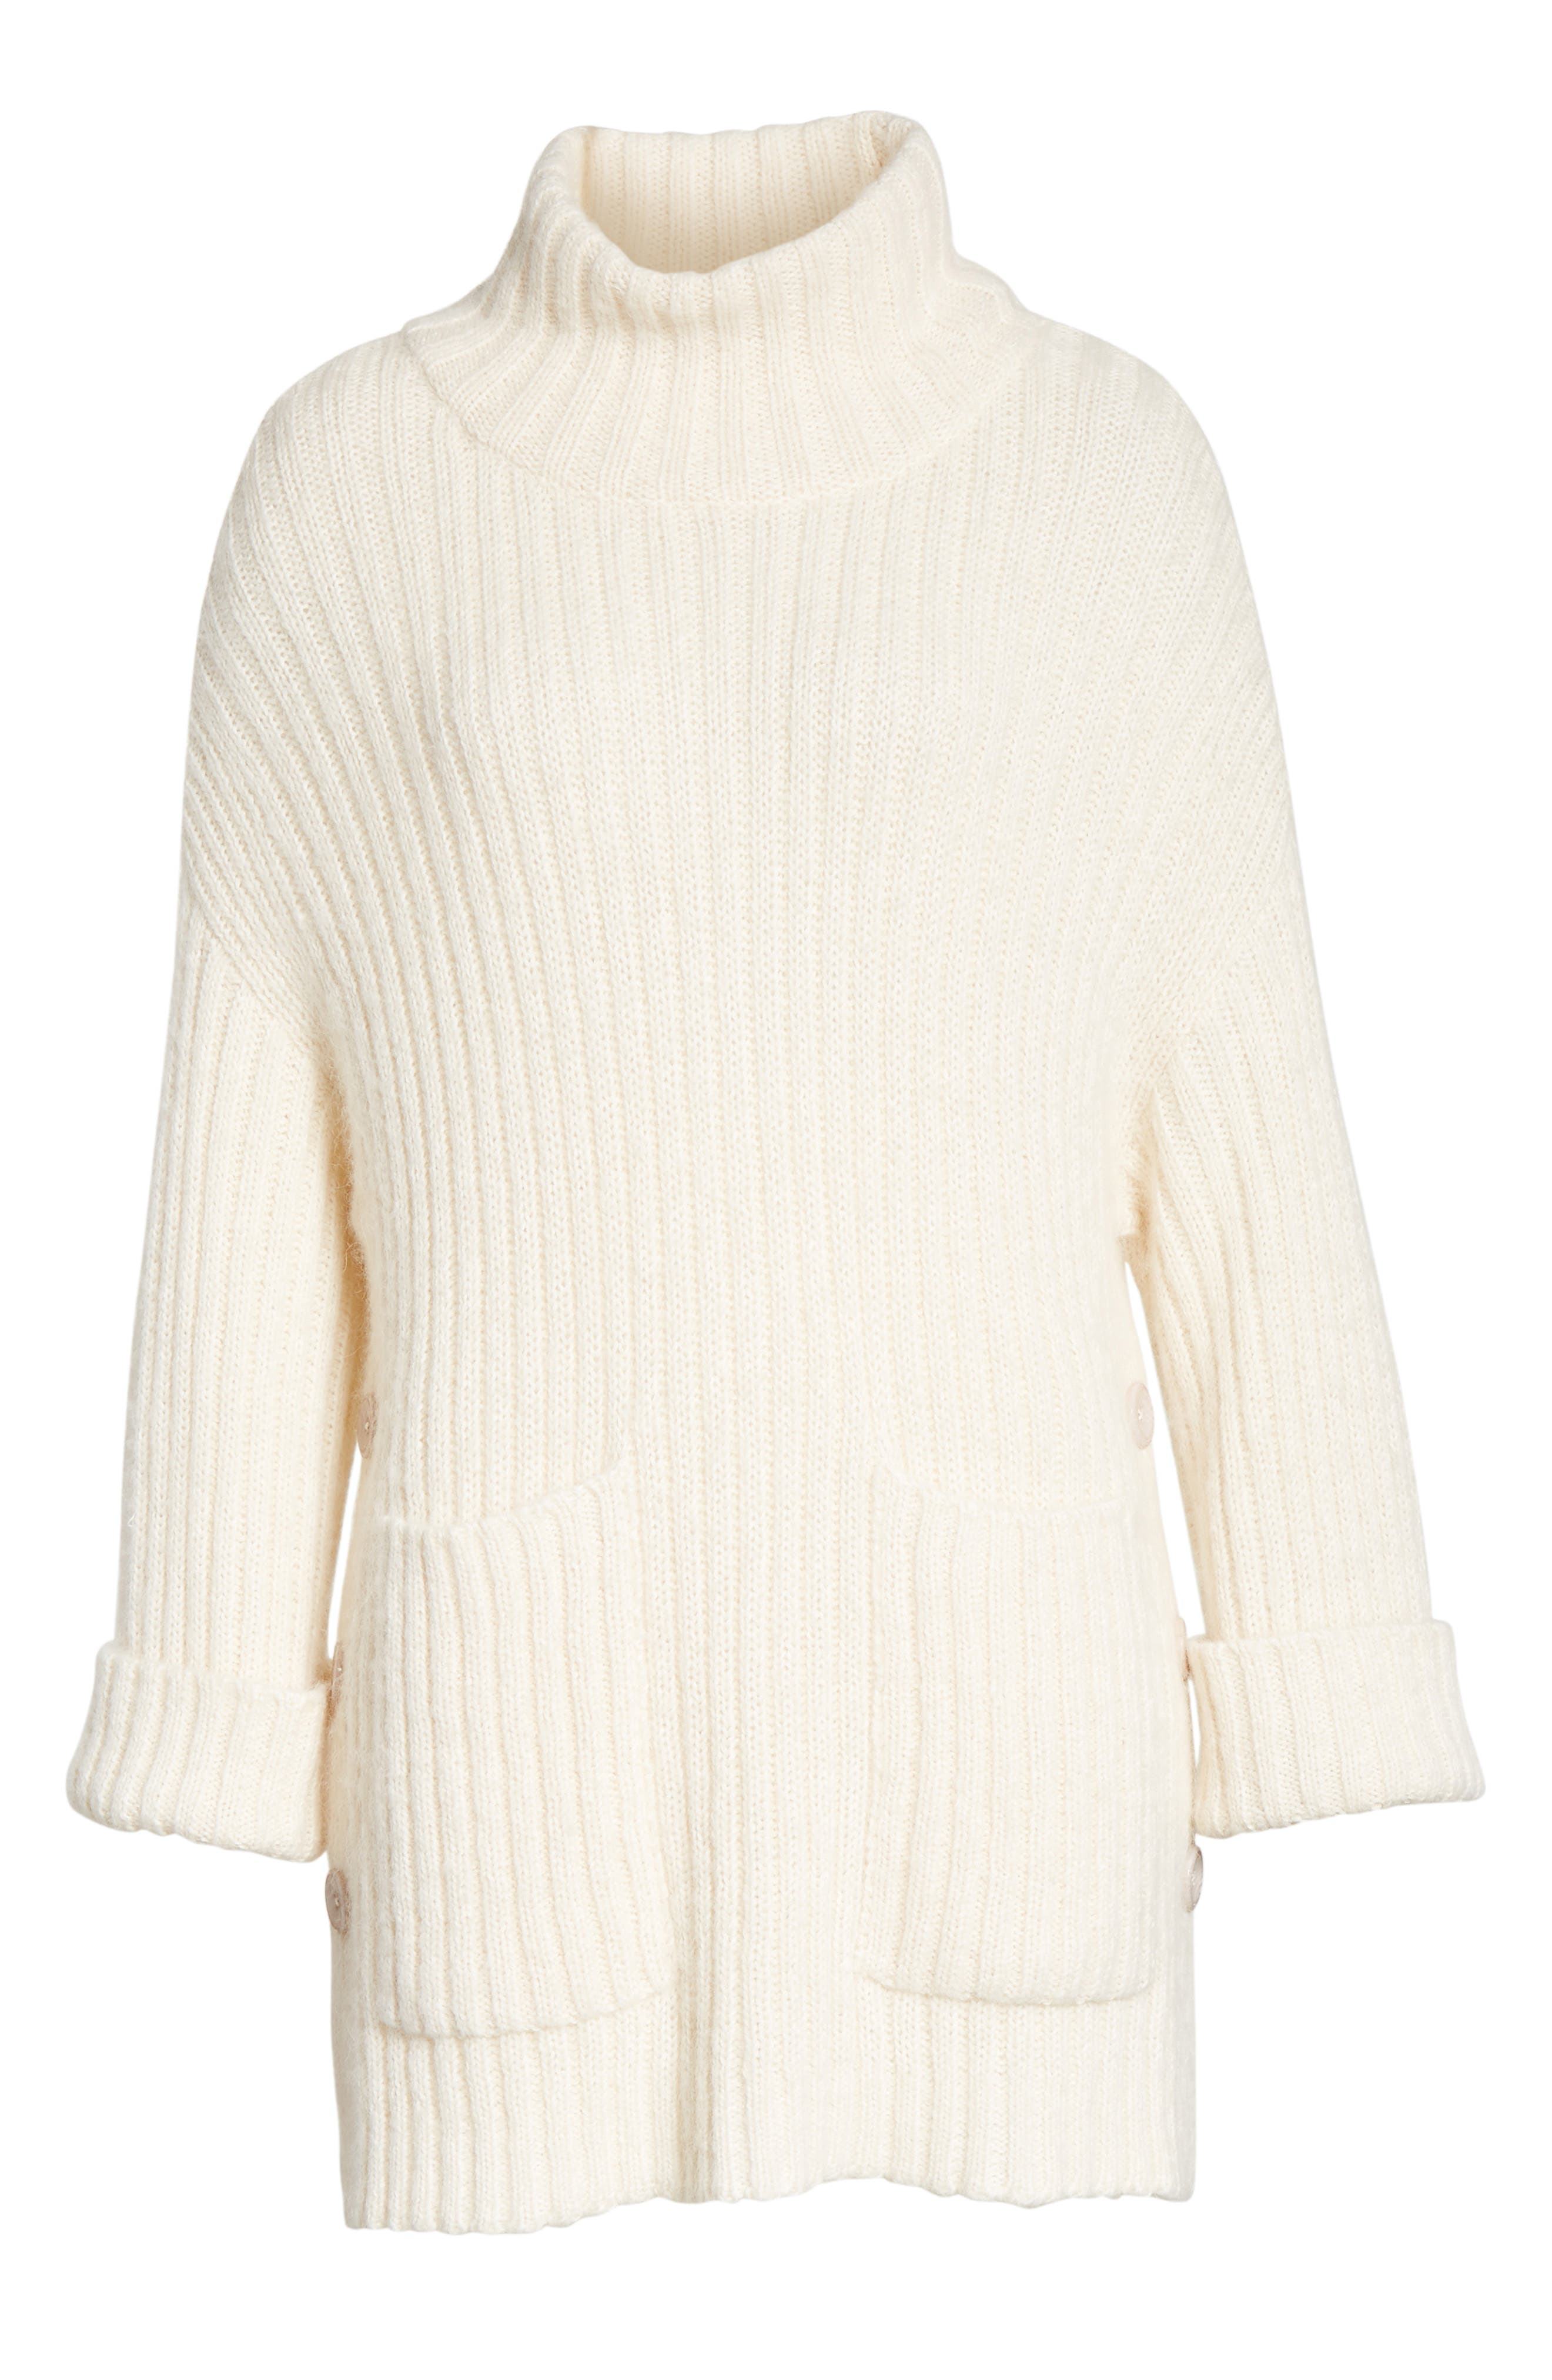 Banain Turtleneck Sweater,                             Alternate thumbnail 6, color,                             114